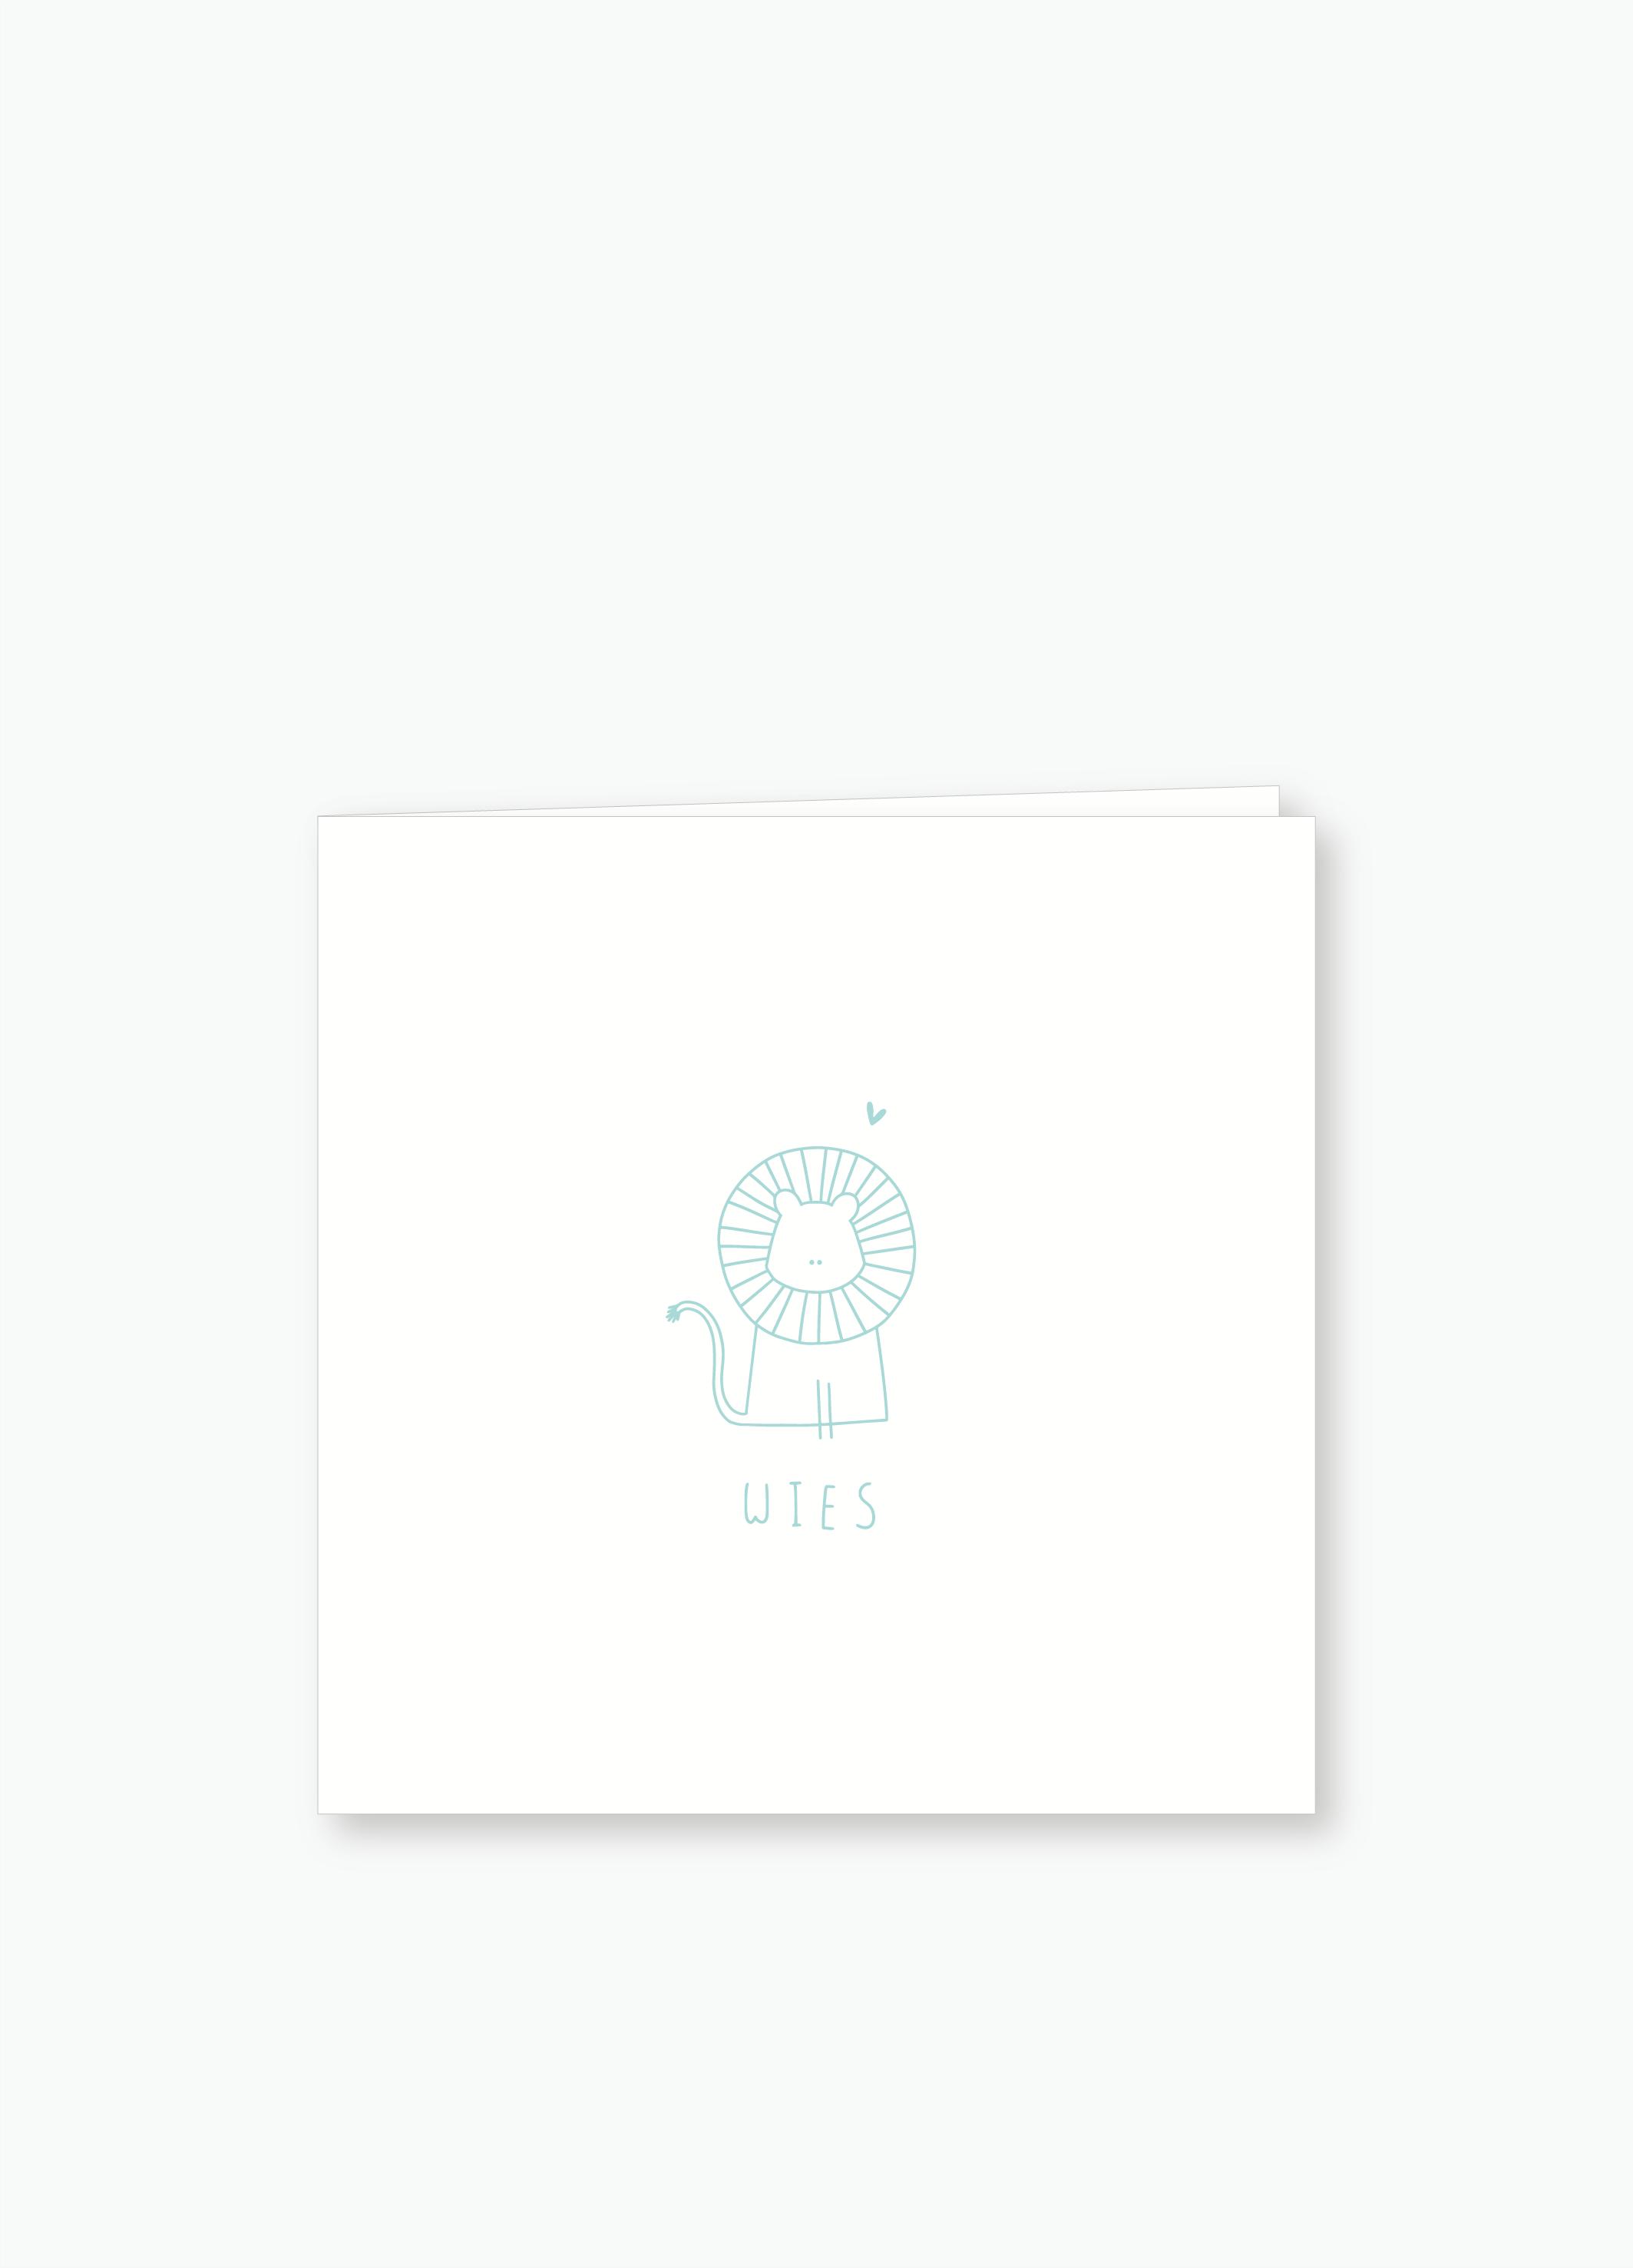 Geboortekaartje Wies | Studio Moose